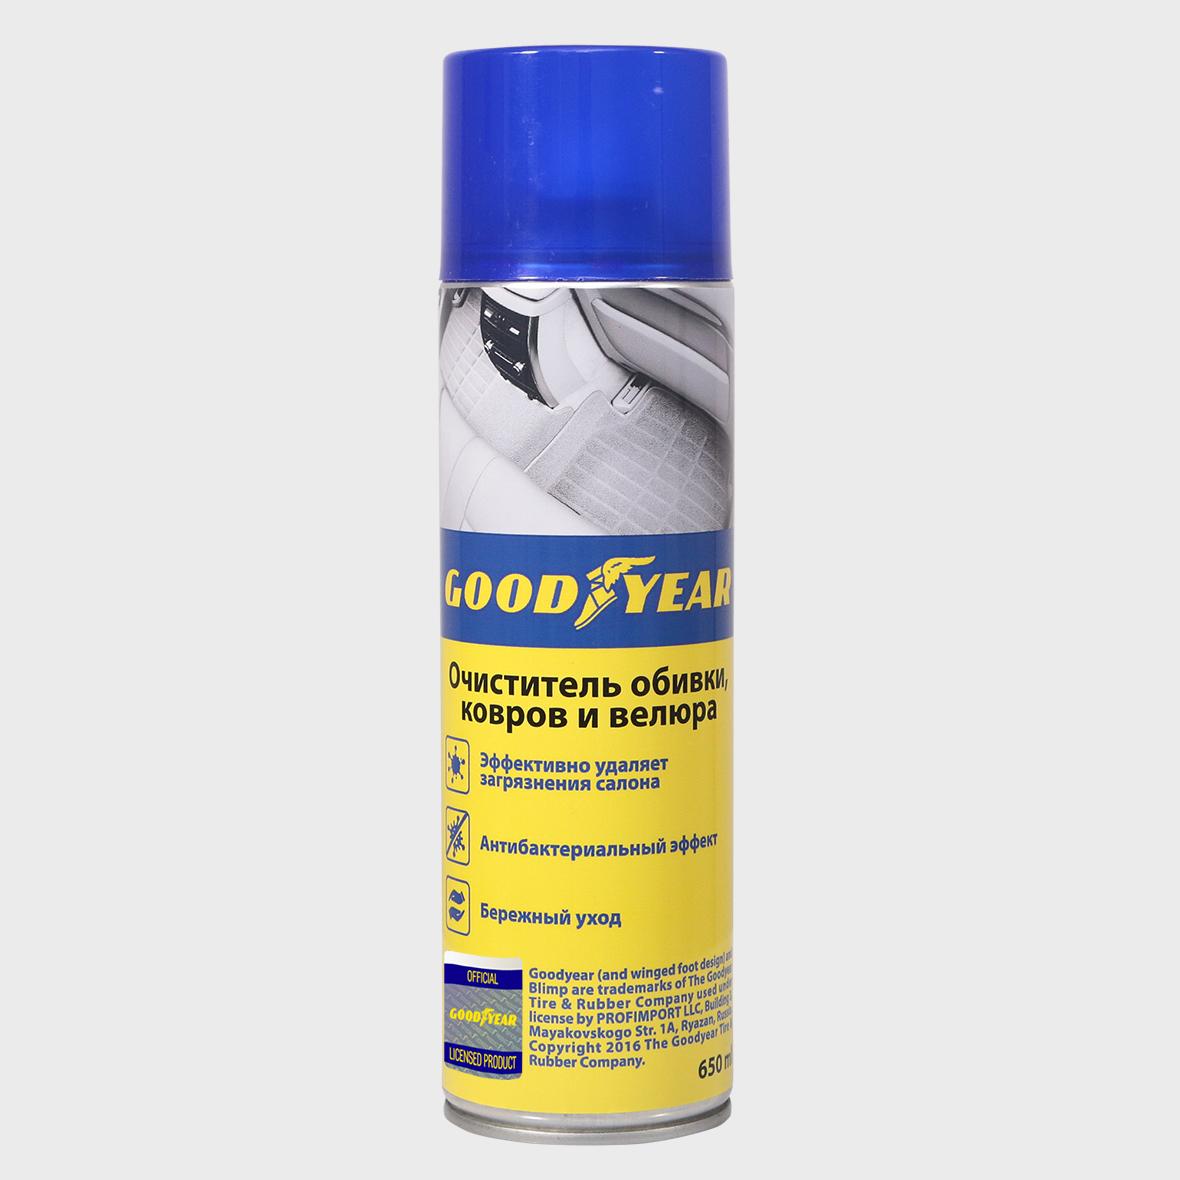 Очиститель Goodyear Gy000711